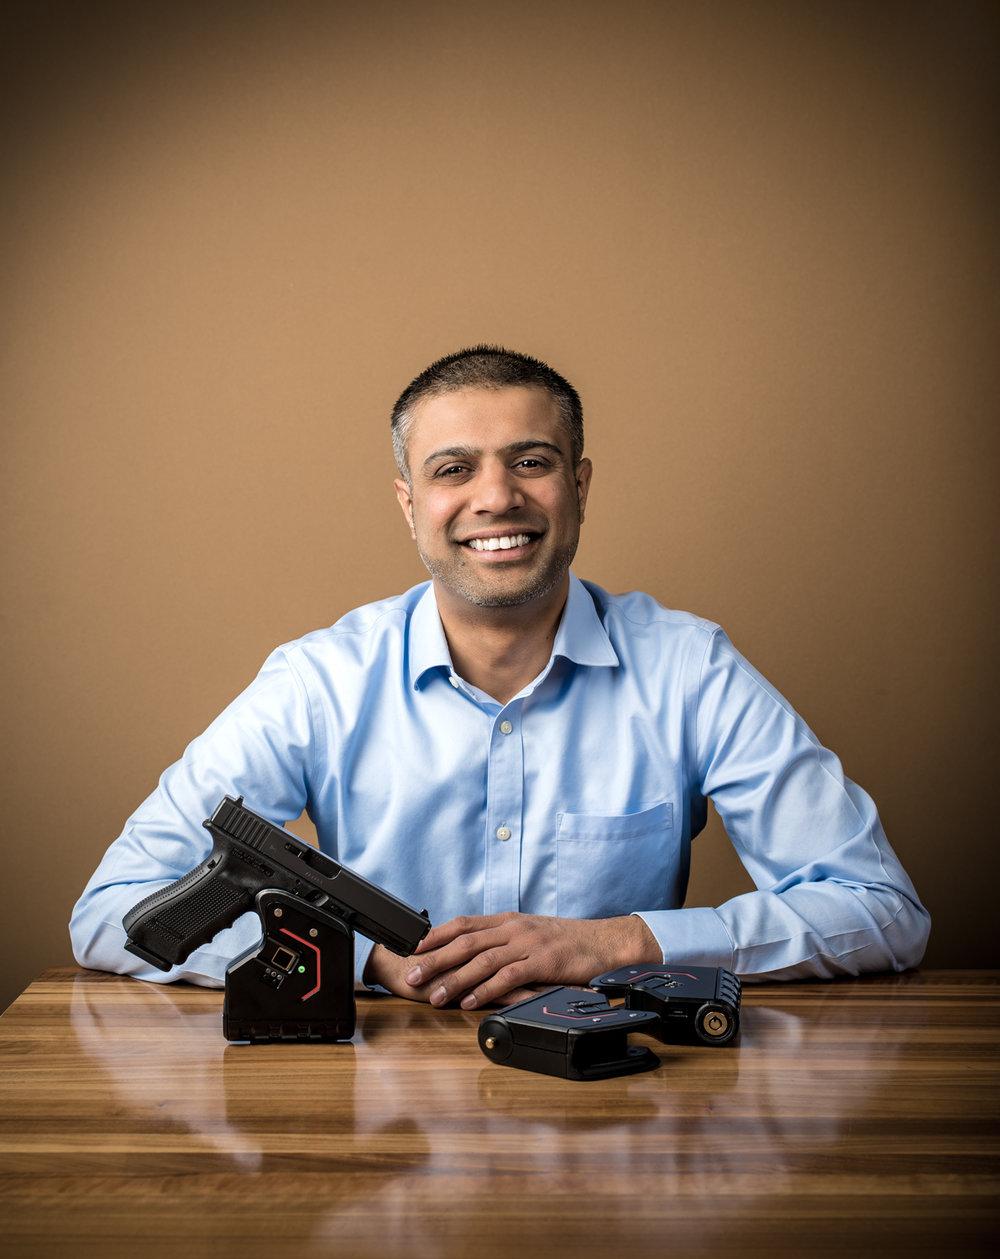 Omer Kiyani, Founder of Sentinl, Inc.